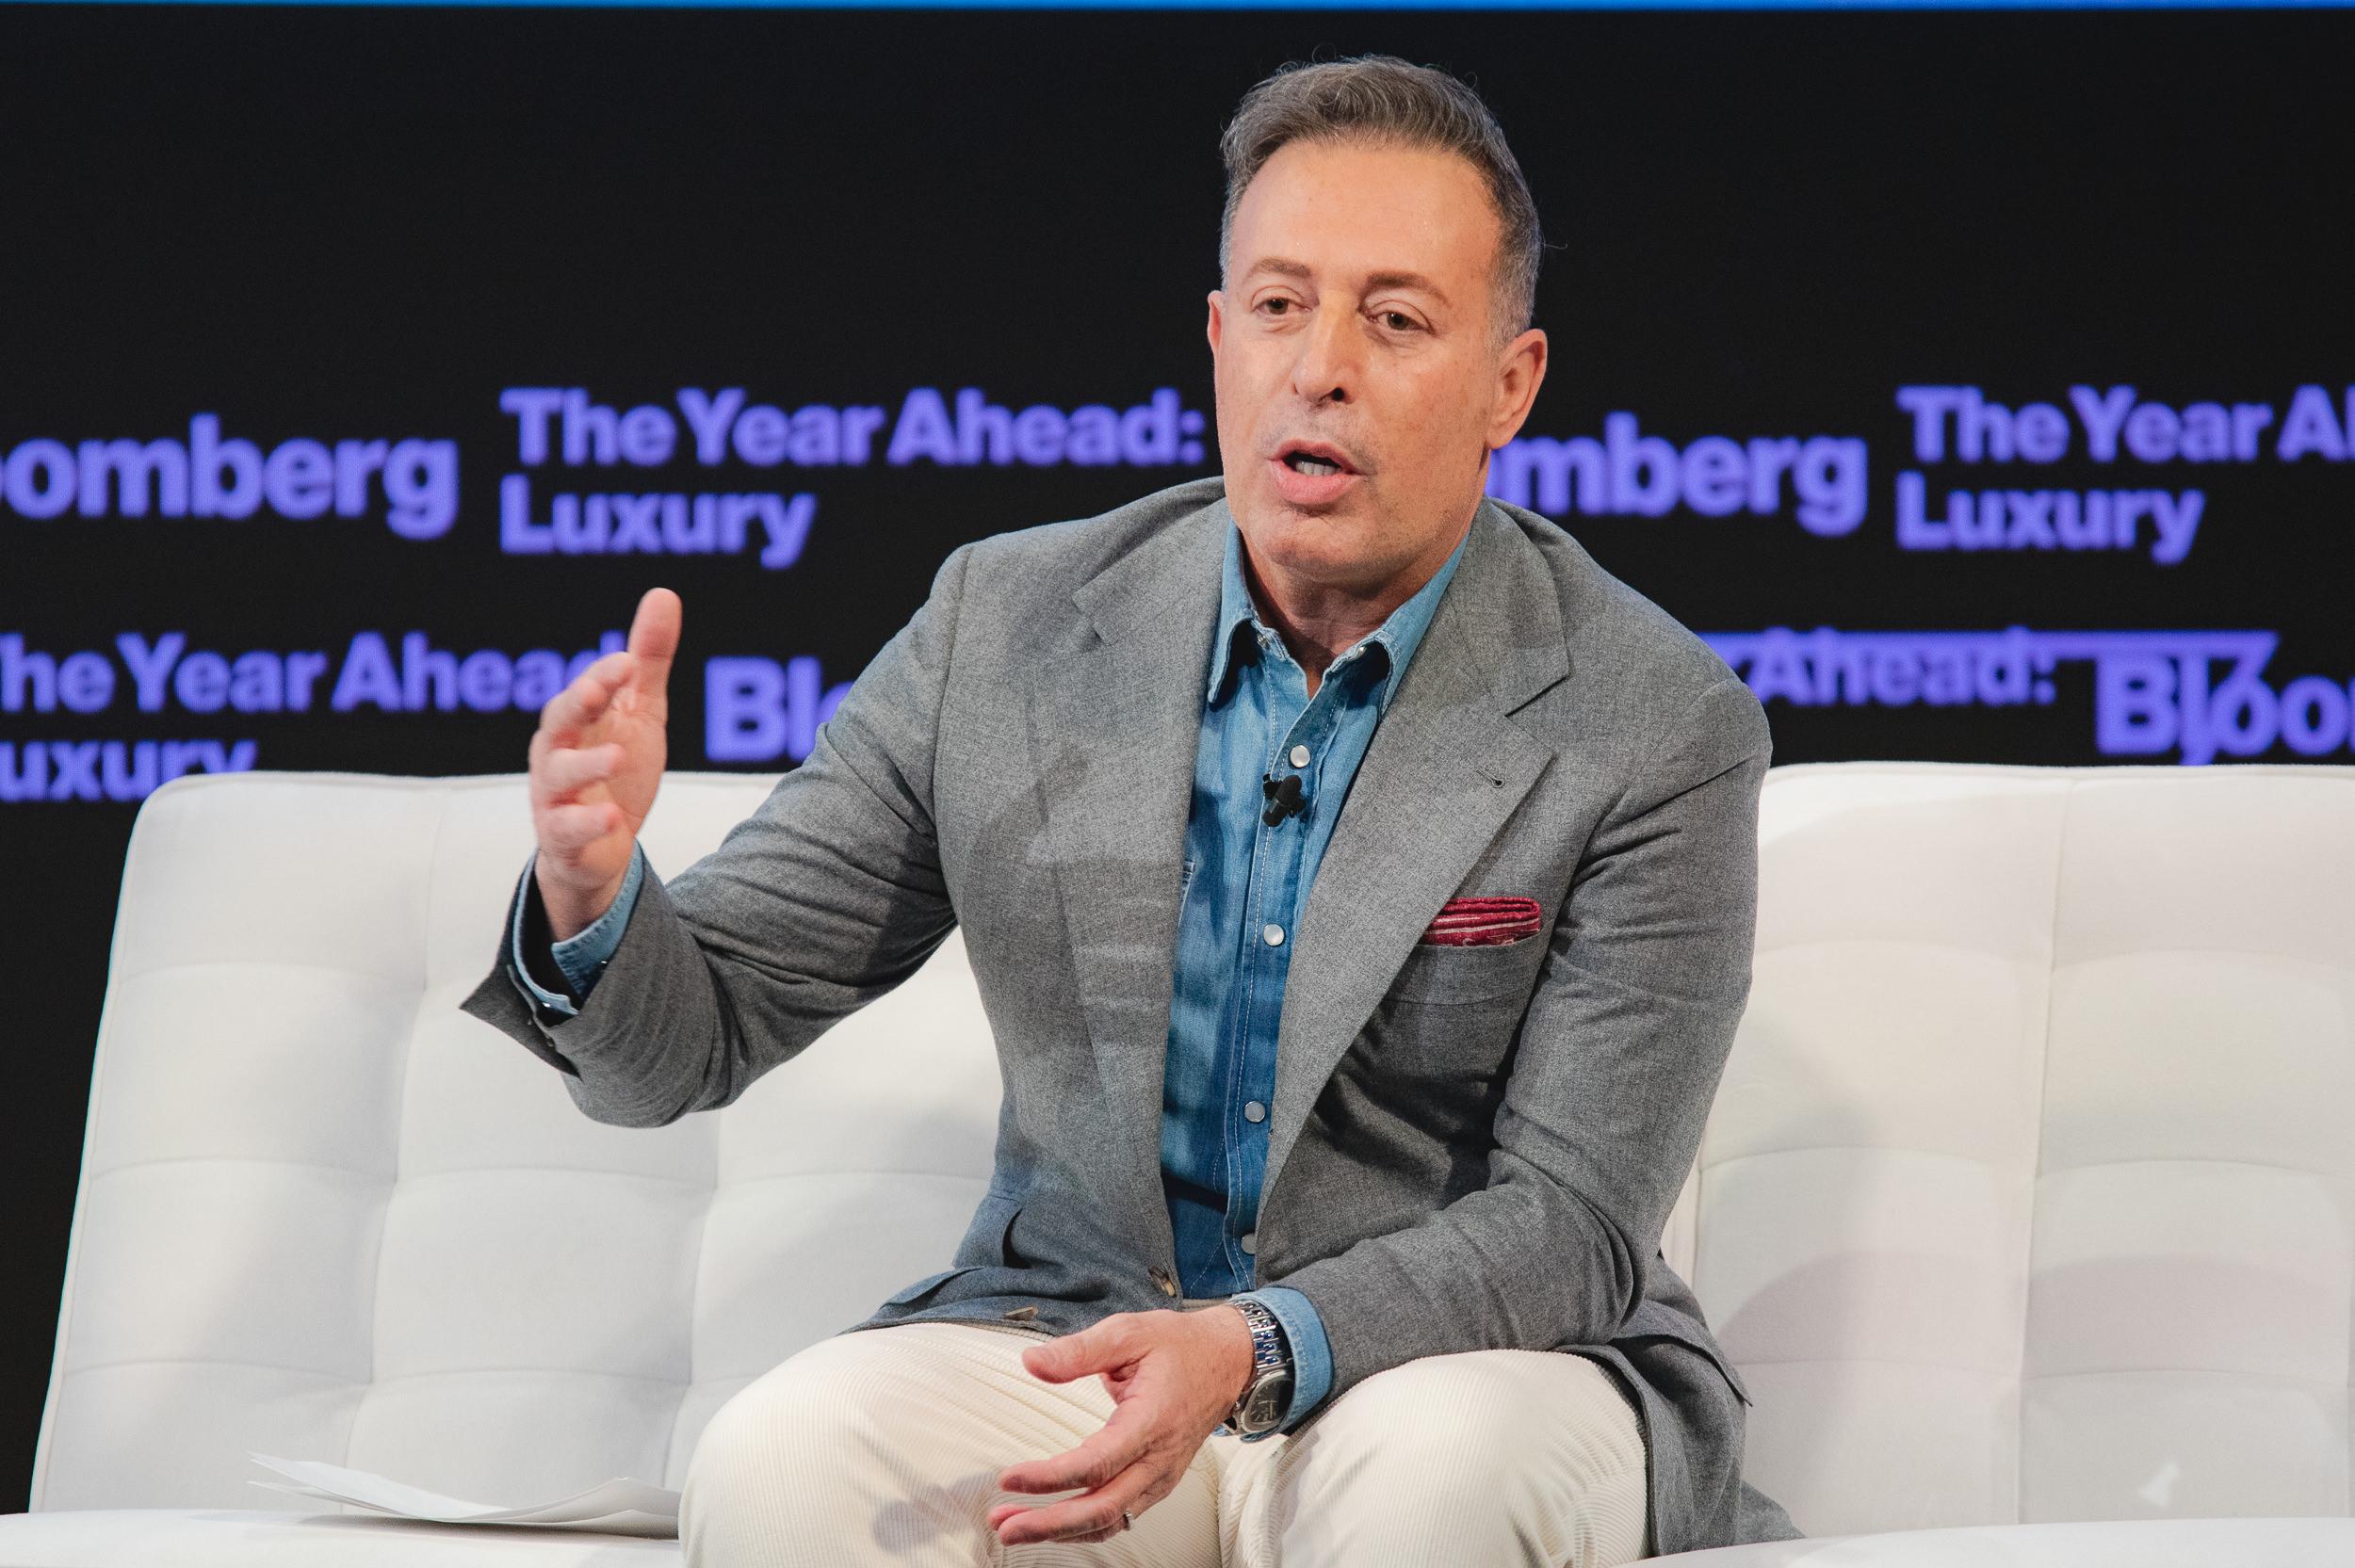 Bloomberg The Year Ahead Luxury 2020